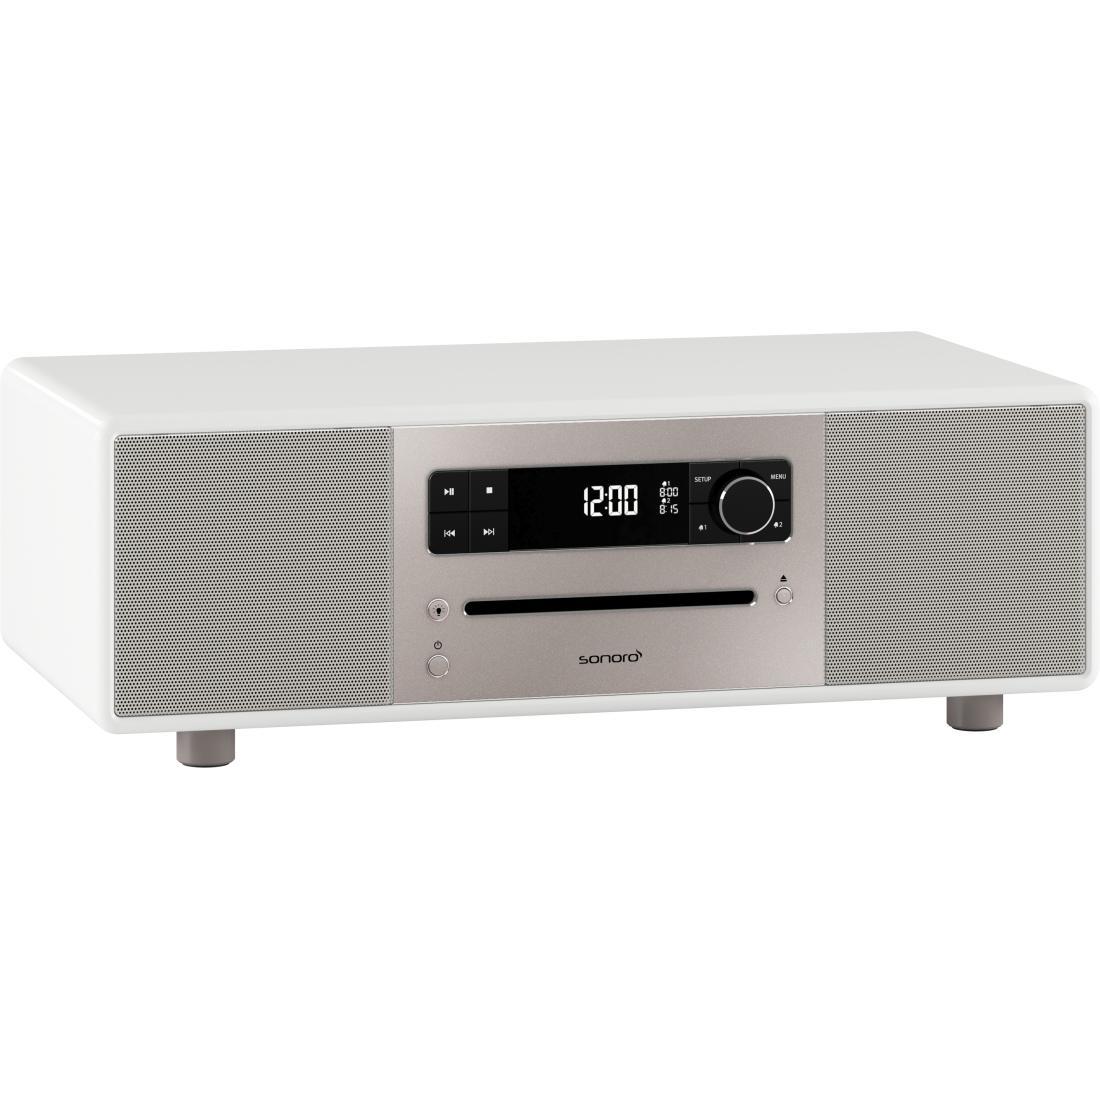 sonoro Lounge Audiosystem weiß